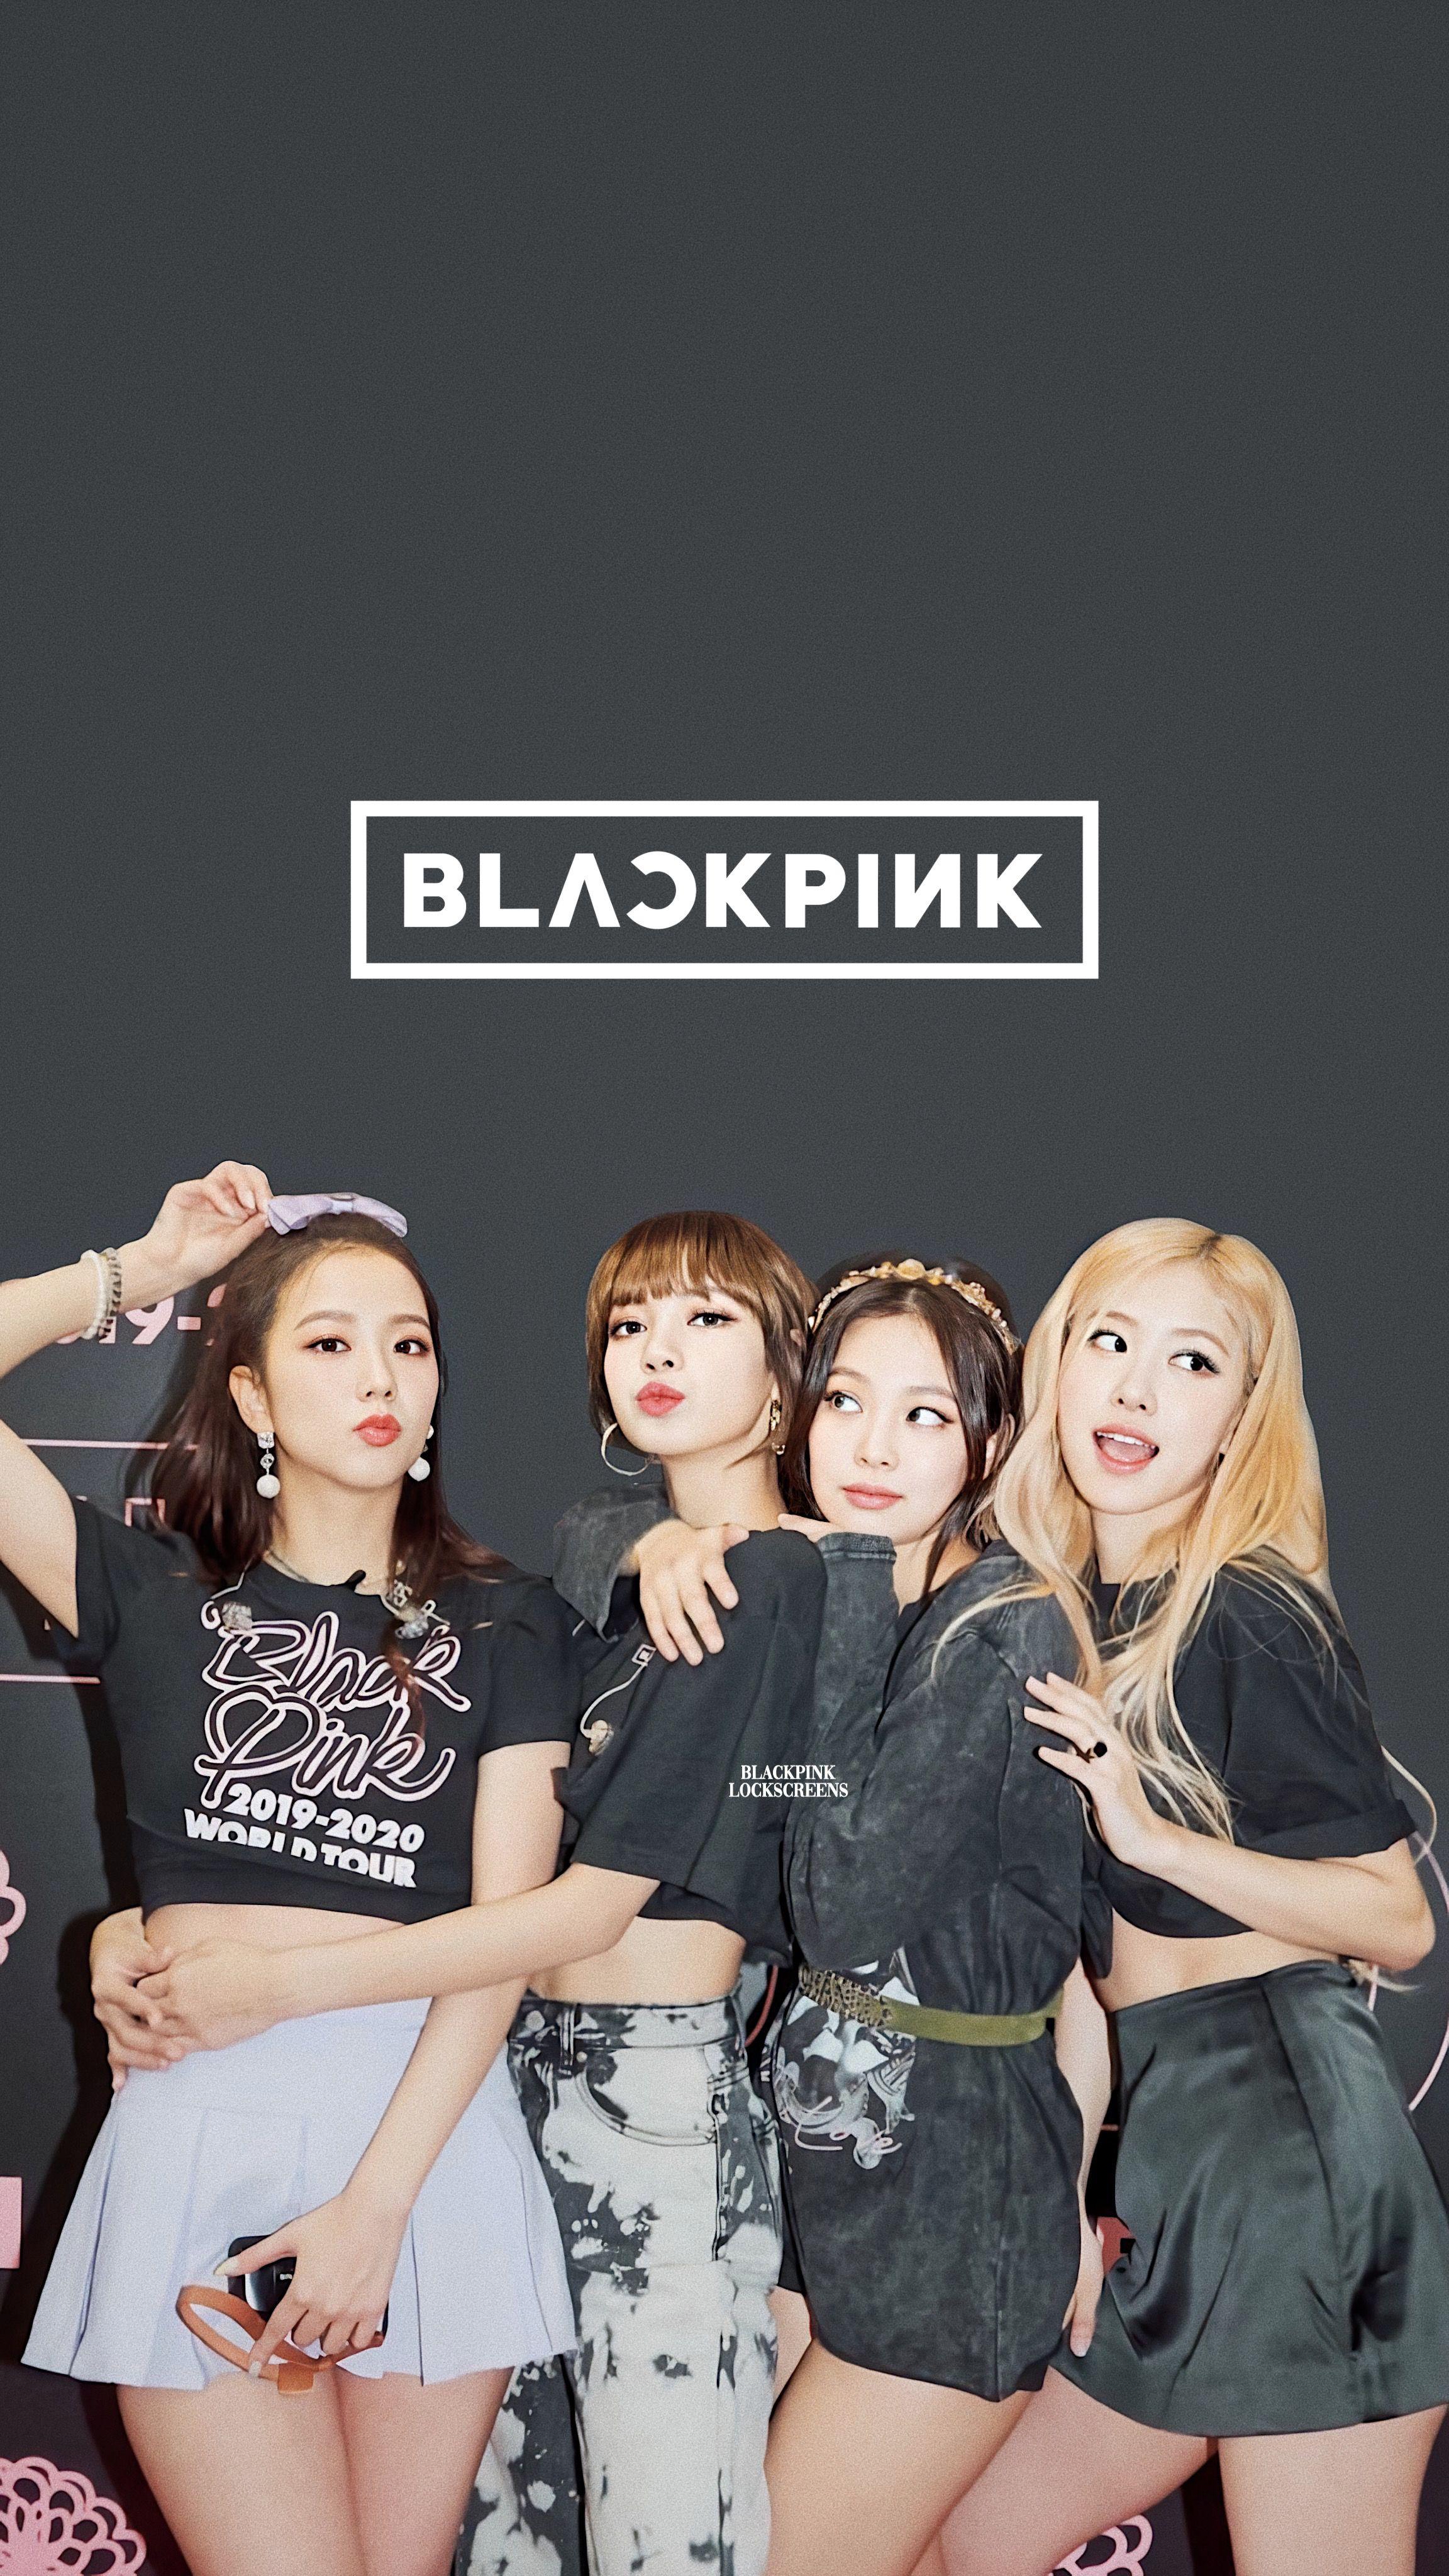 ˏˋblackpinklockscreensˎˊ In 2020 Black Pink Kpop Blackpink Photos Blackpink